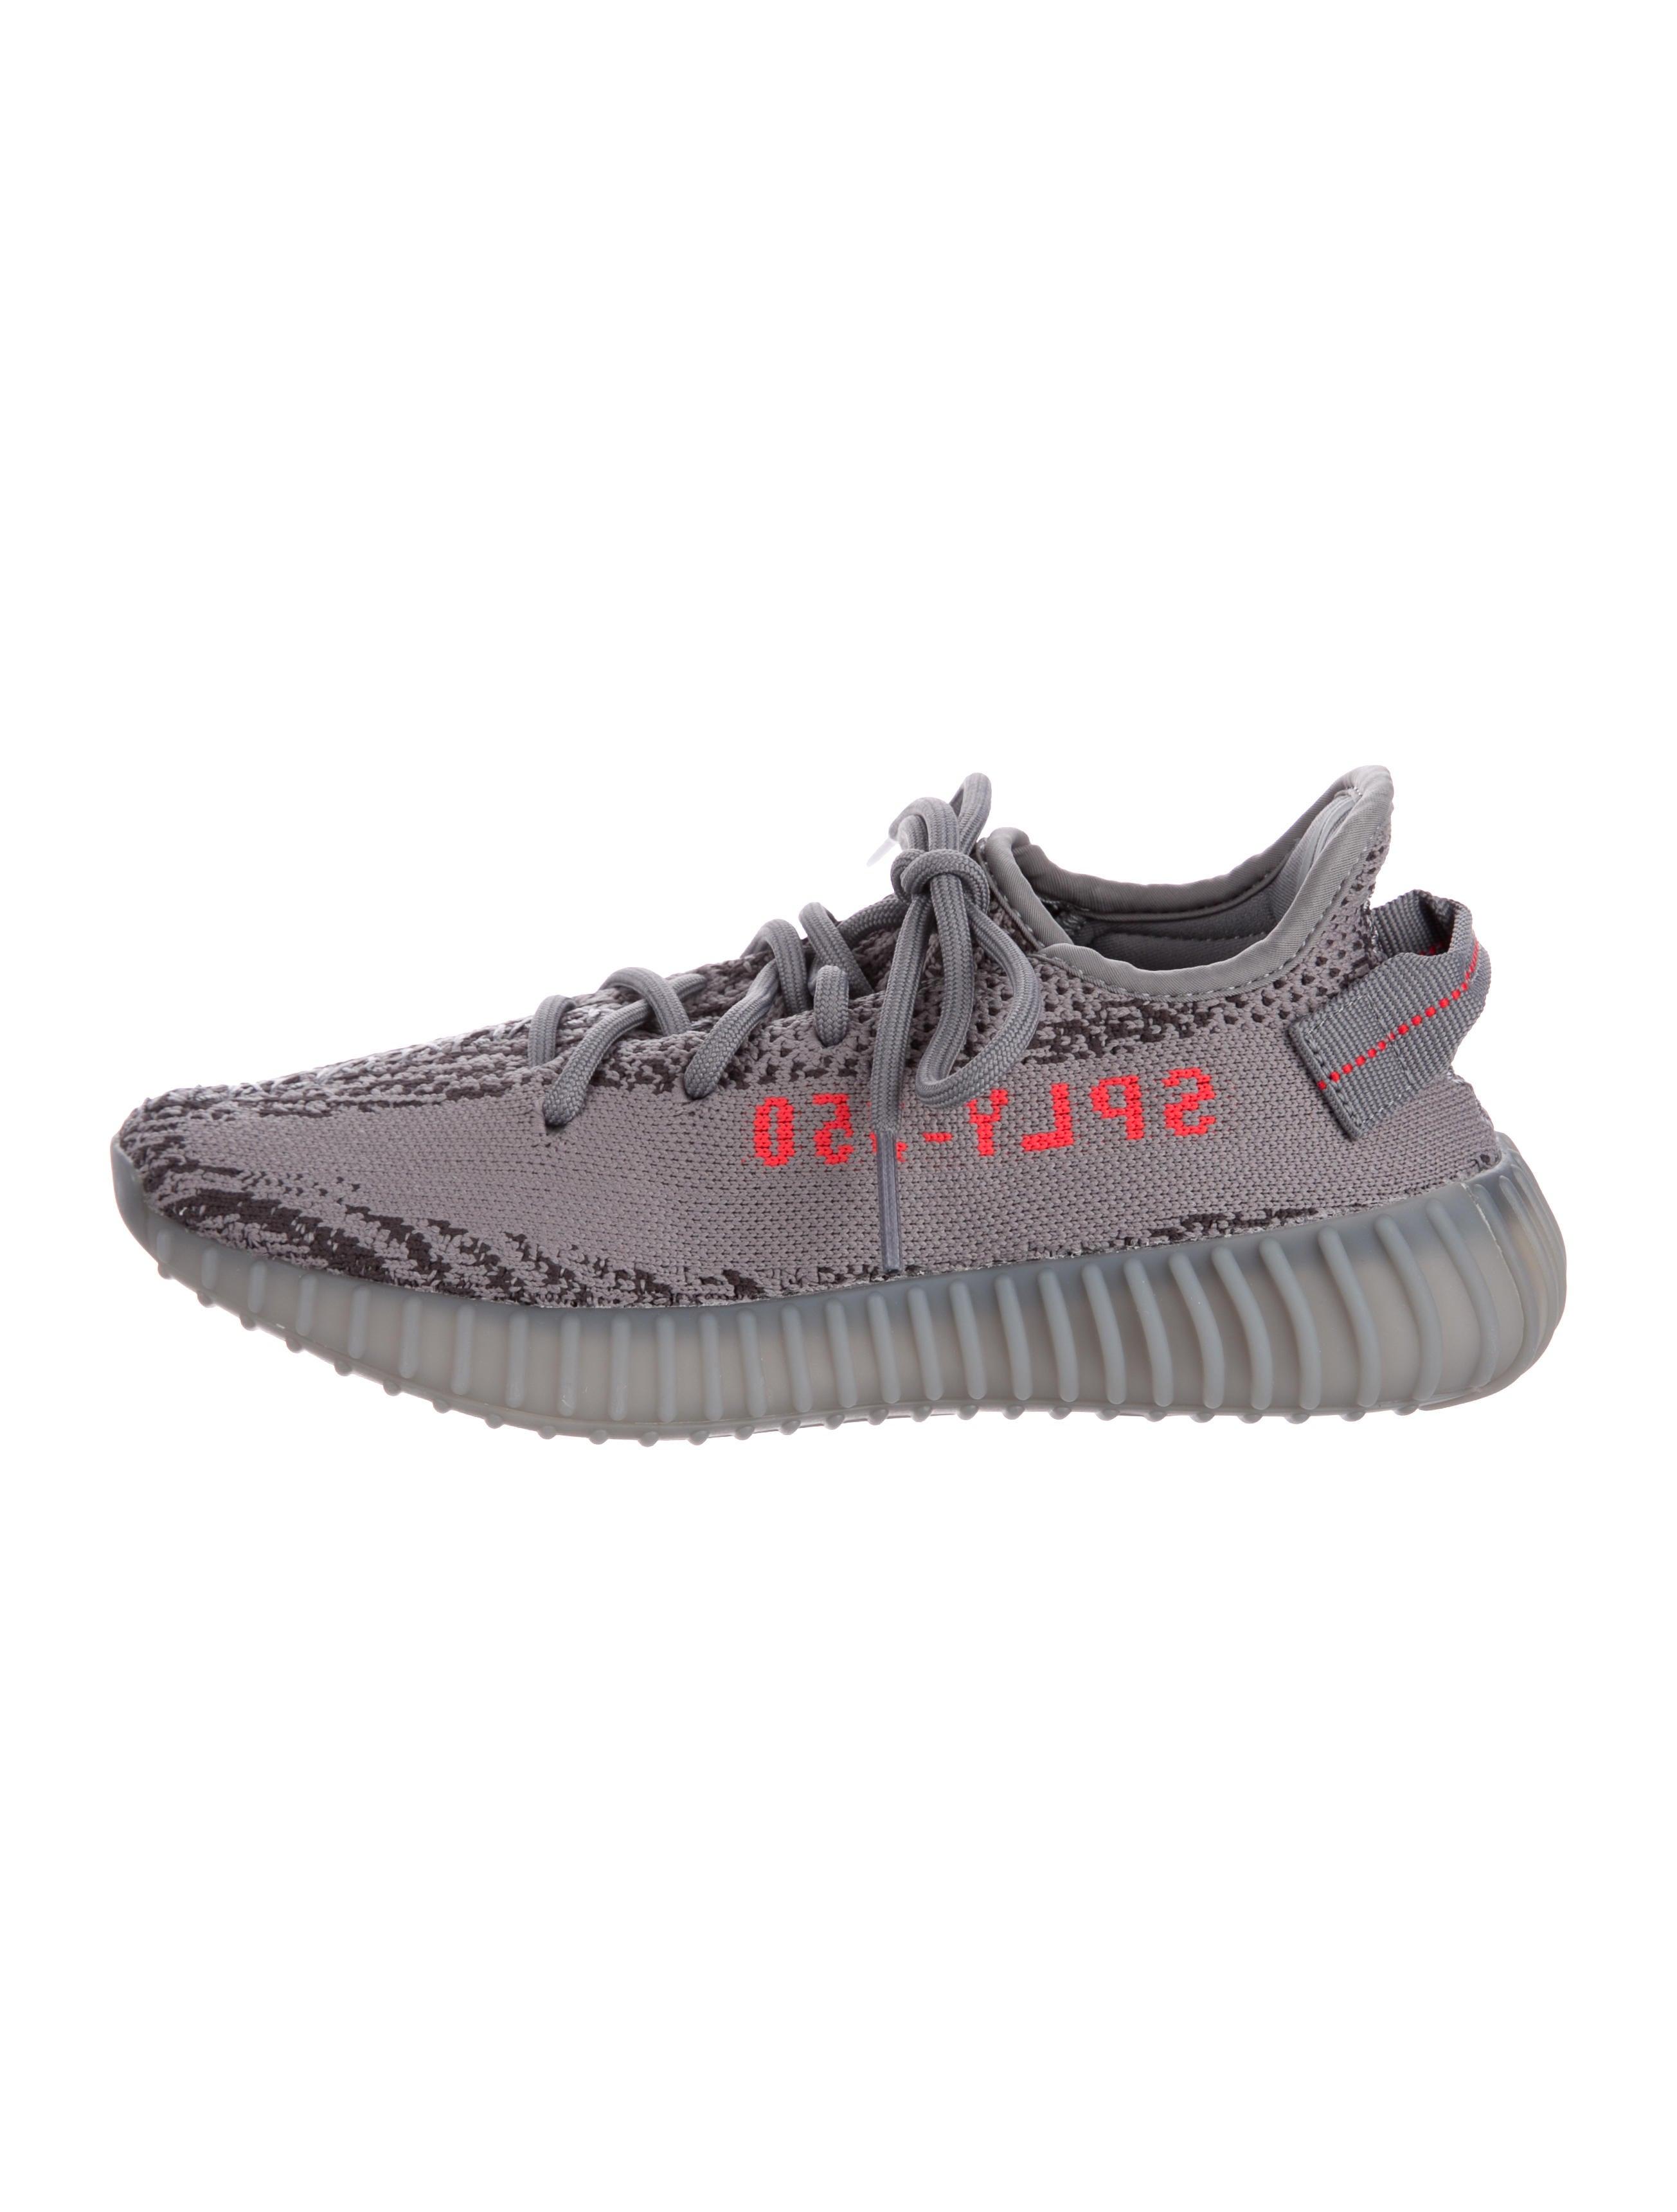 00b201615 Yeezy x Adidas 2017 350 V2 Beluga 2.0 Boost Sneakers w  Tags - Shoes ...